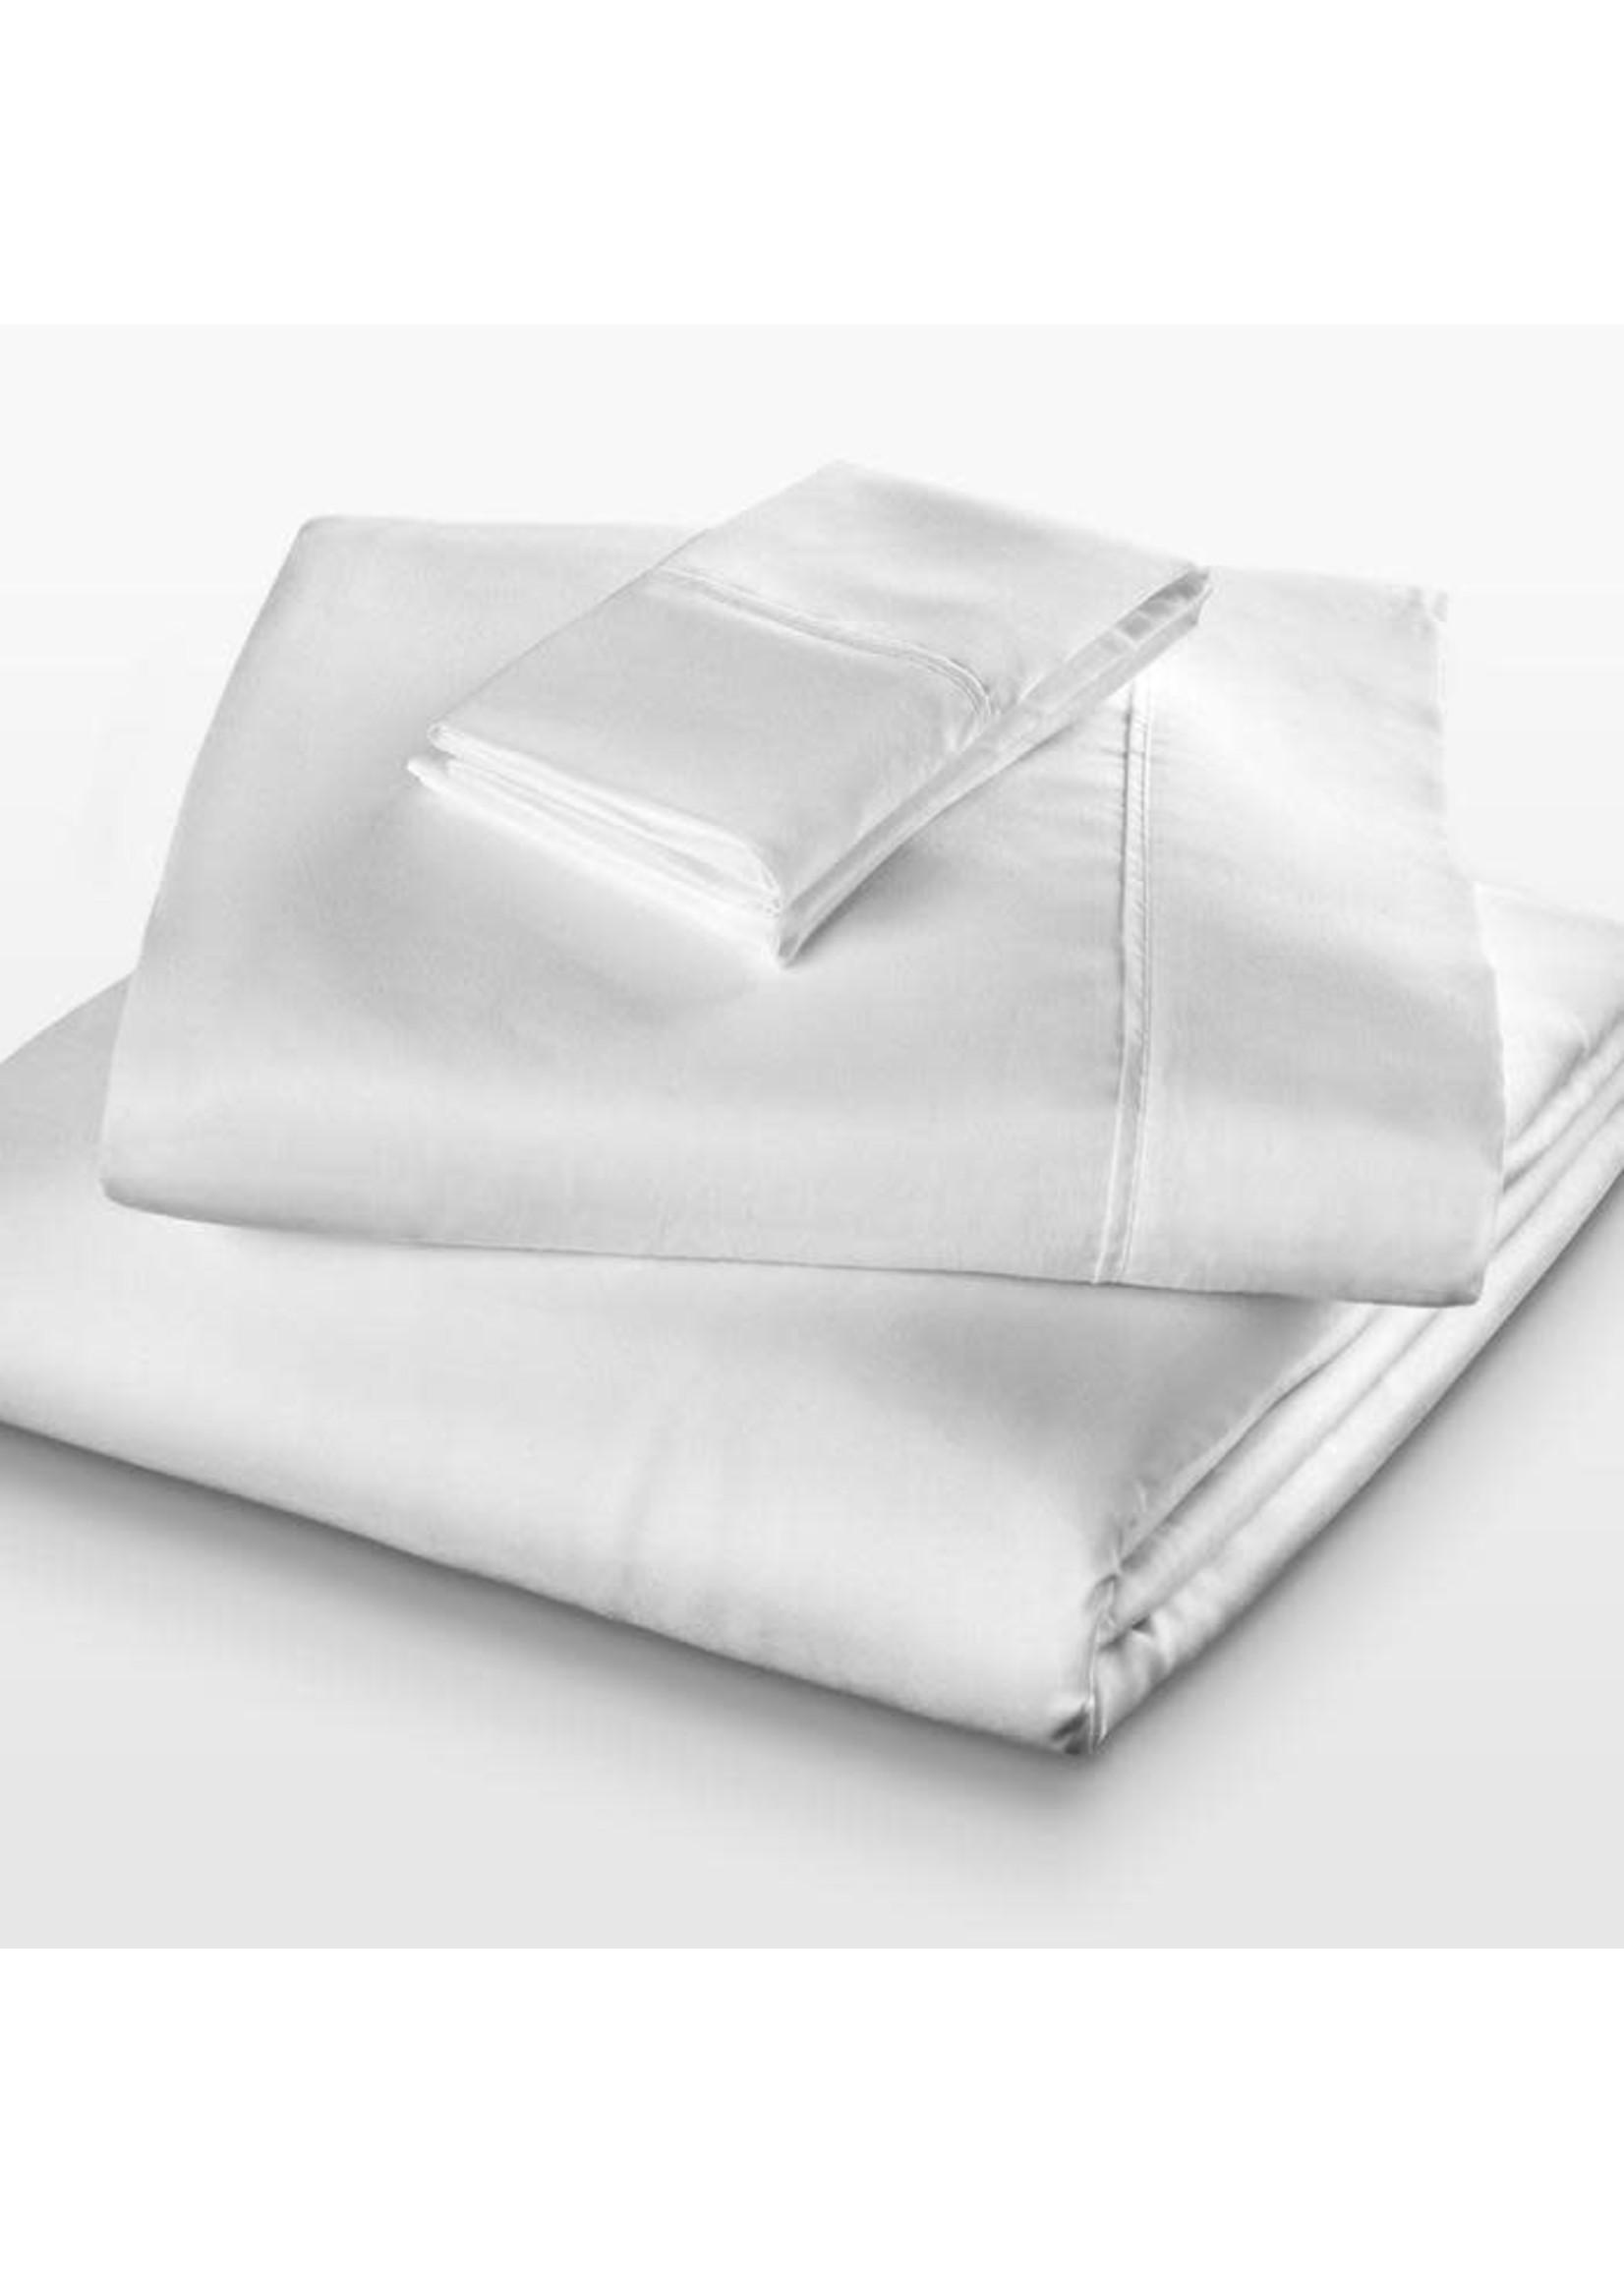 PURECARE LUXURY MICROFIBER SHEET SET QUEEN WHITE